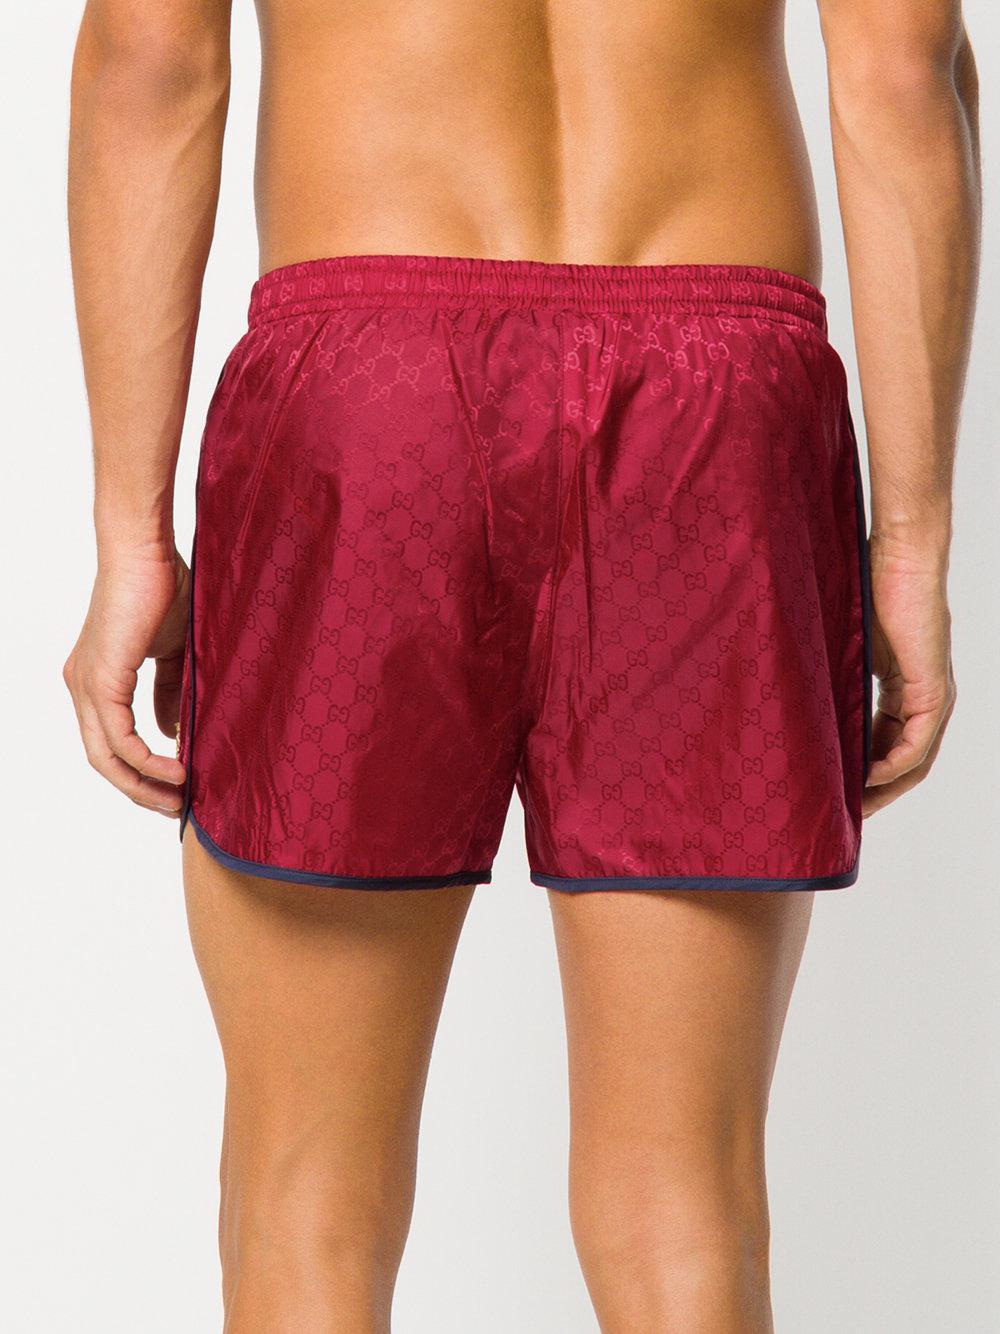 bebad0b8d0 Gucci Gg Supreme Swim Shorts in Red for Men - Lyst